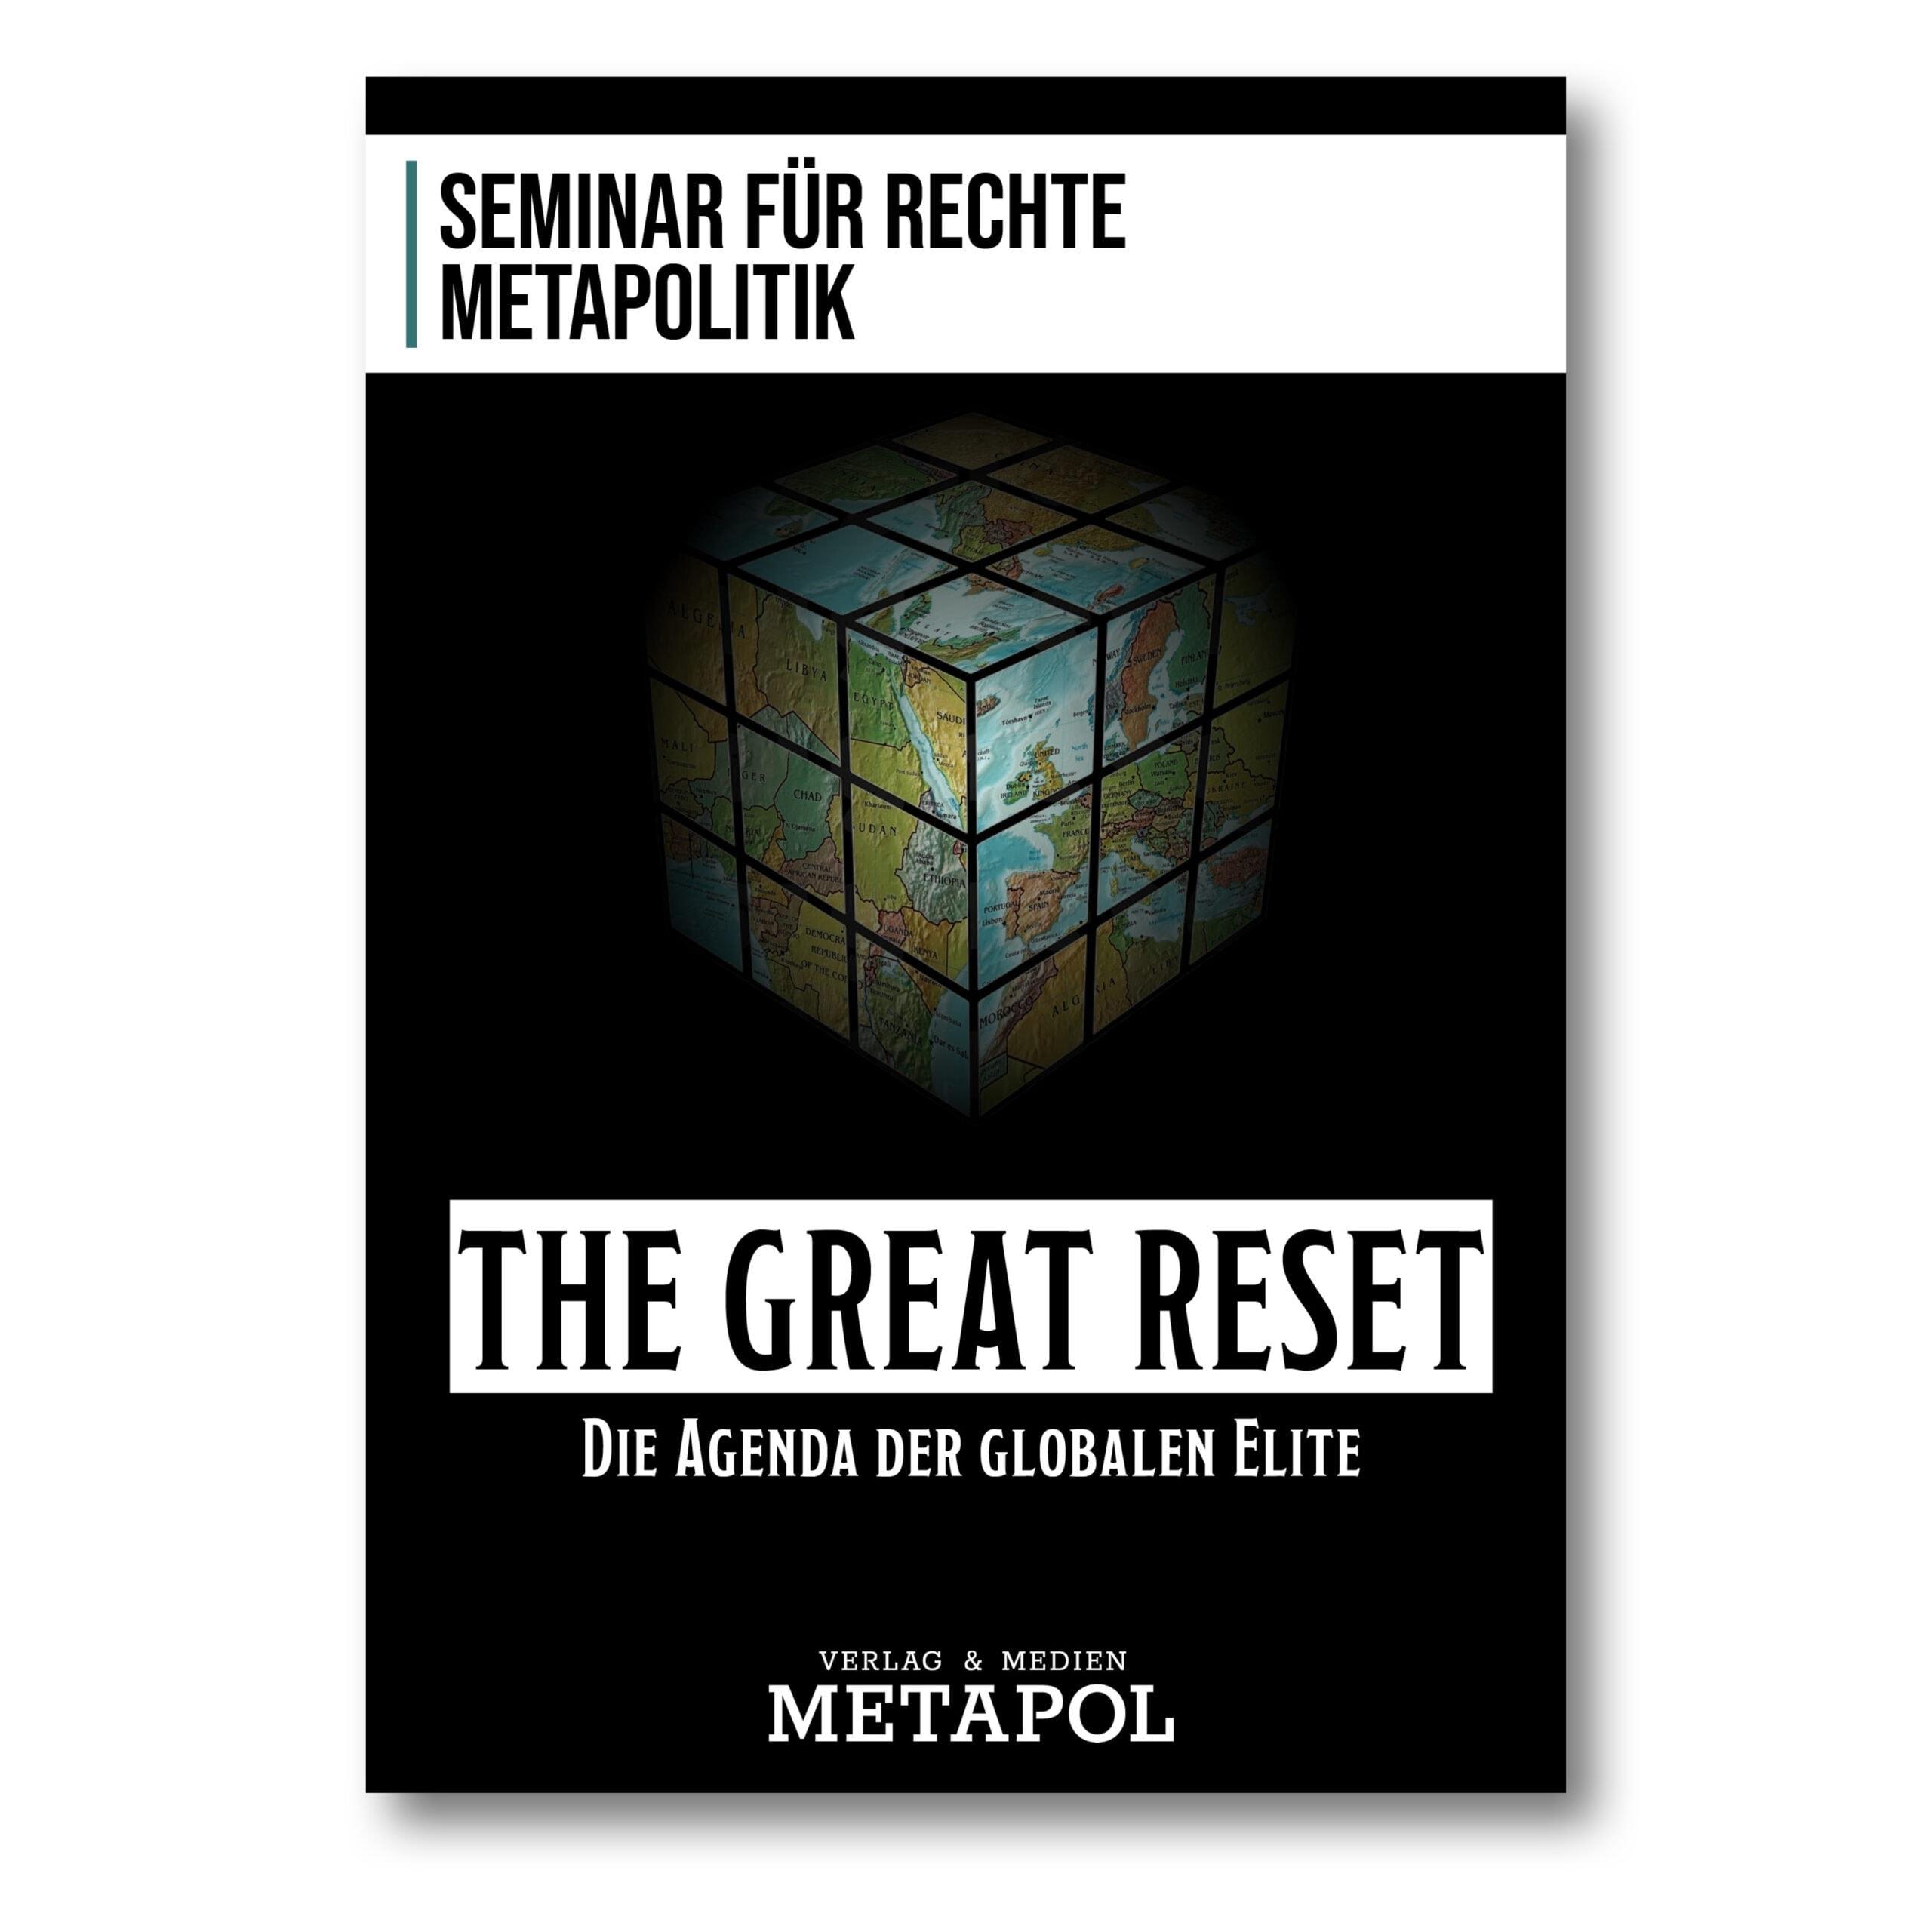 Seminar für rechte Metapolitik-The Great Reset